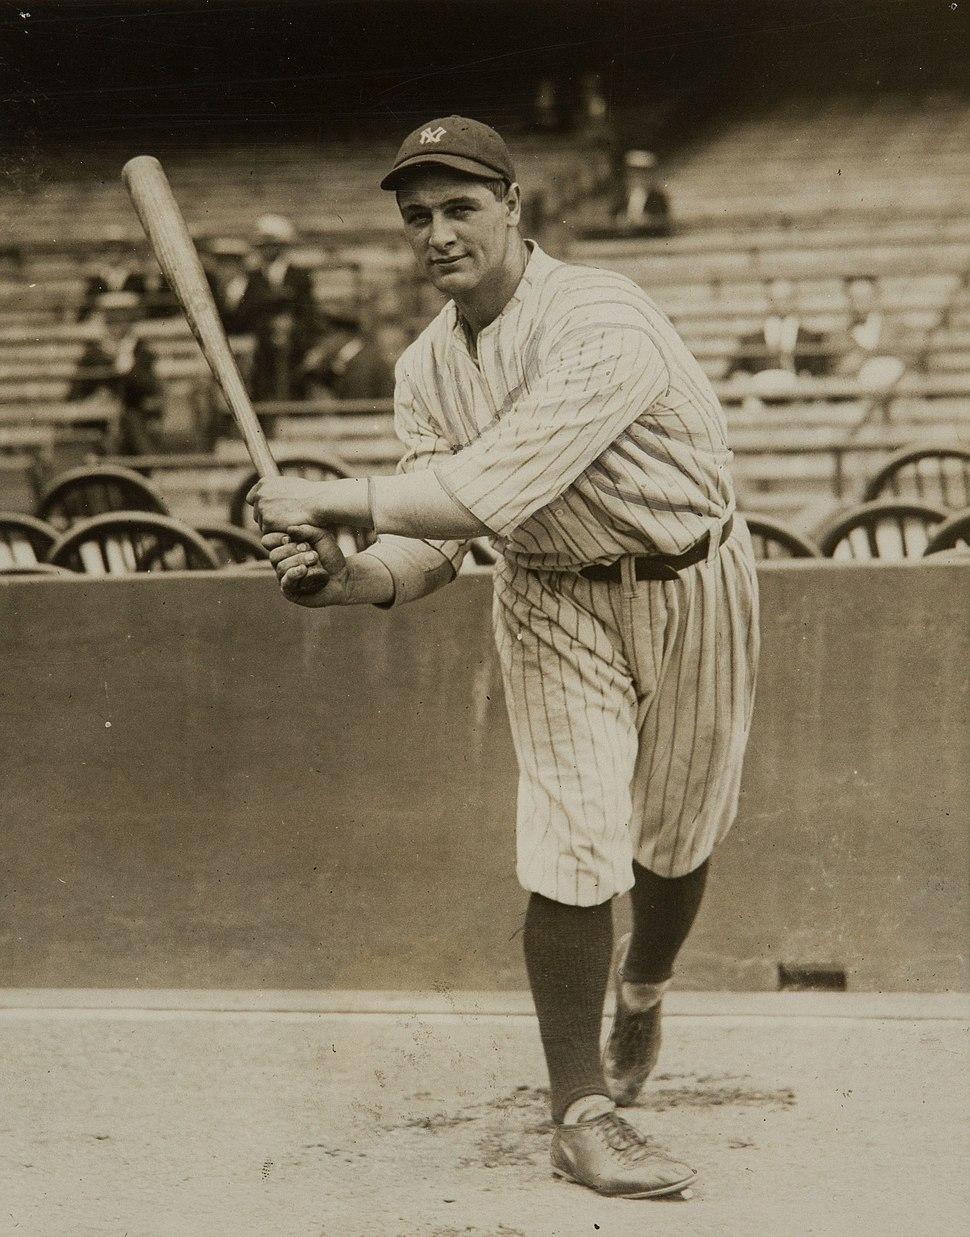 Lou Gehrig as a new Yankee 11 Jun 1923